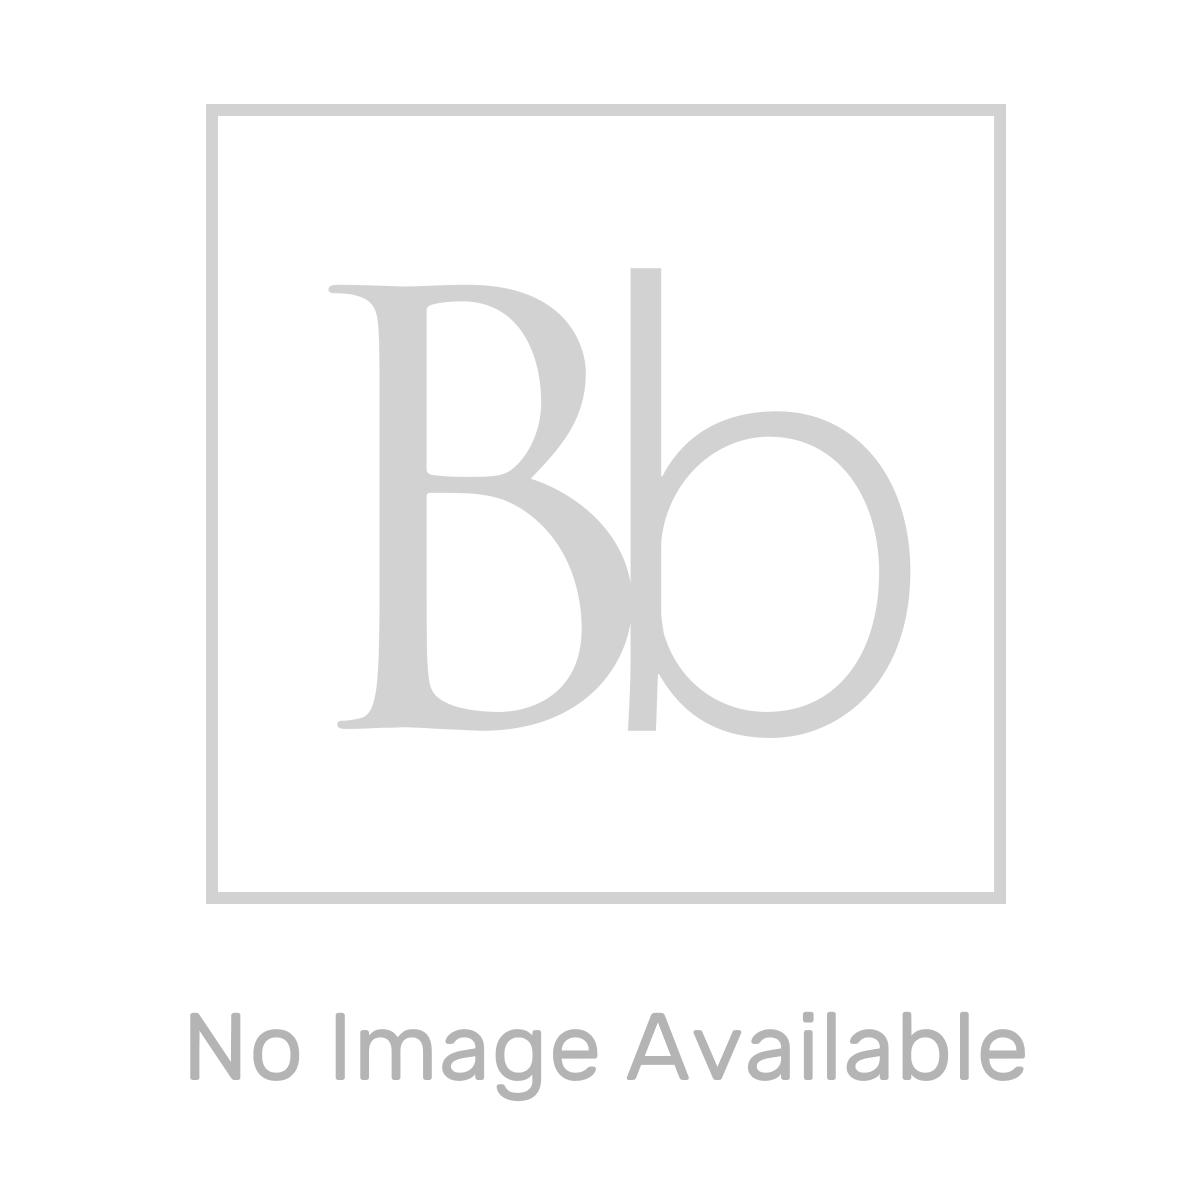 RAK Dublin Chrome Lever Handle Kitchen Sink Mixer Tap